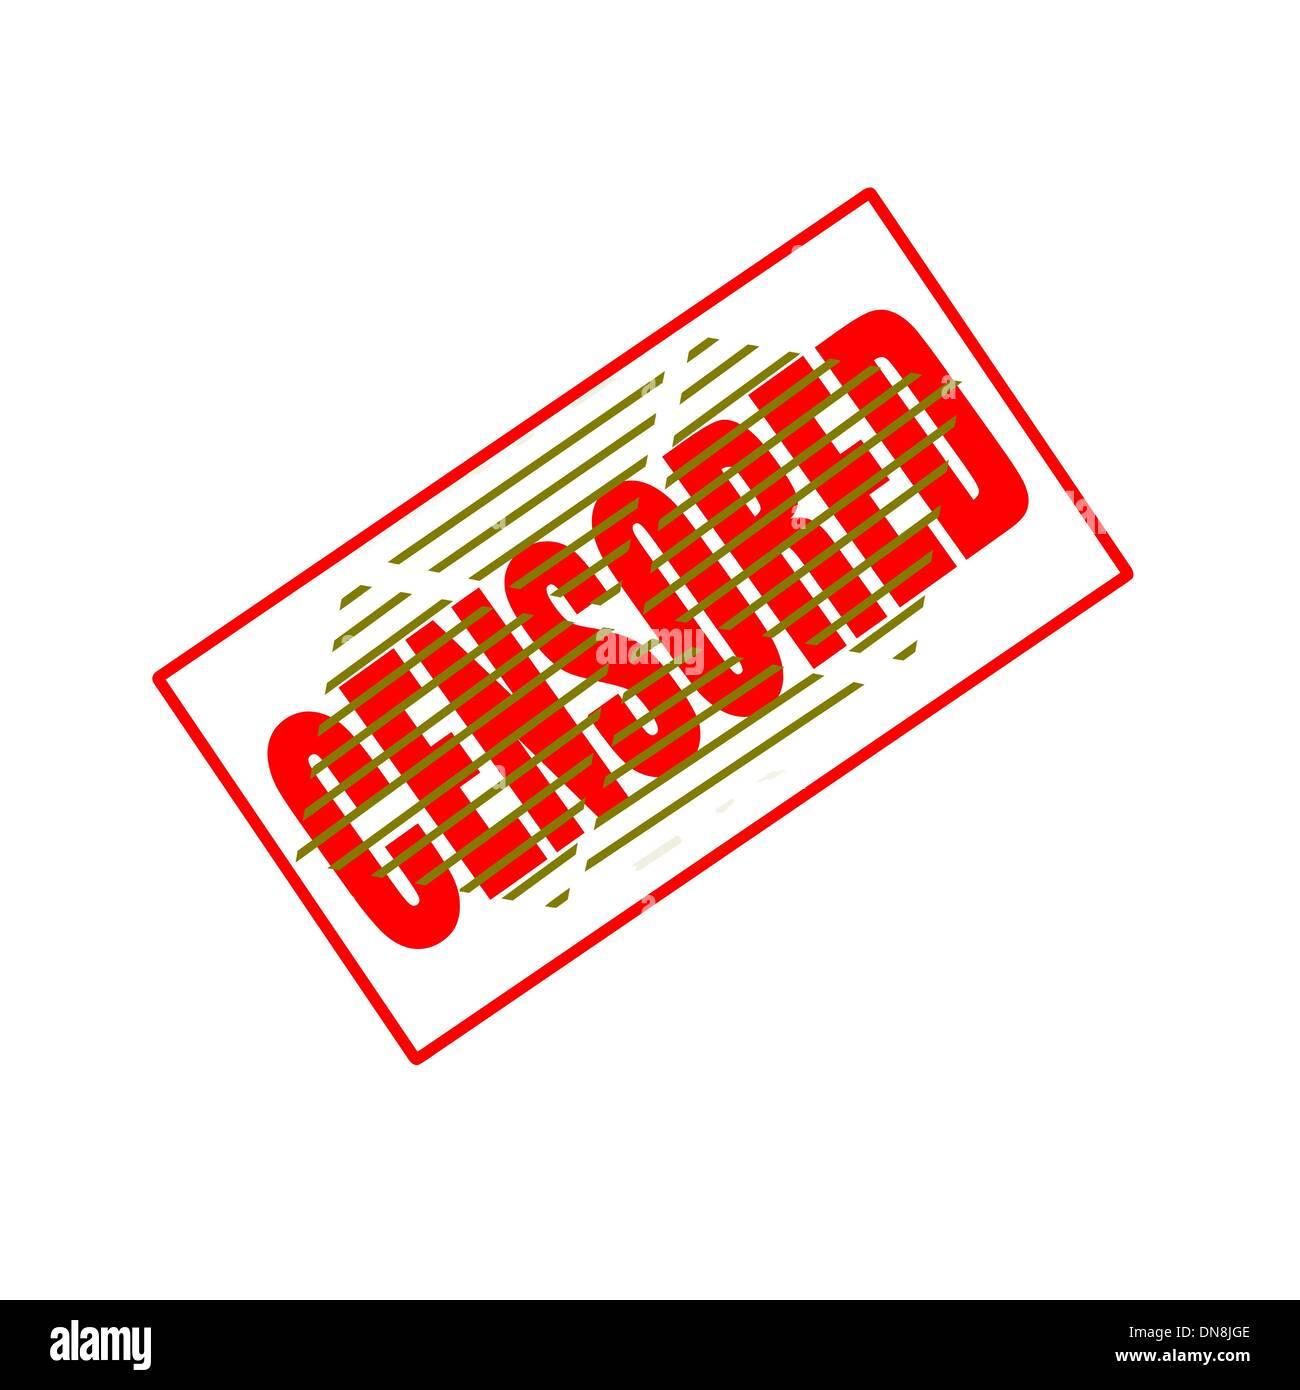 Censored - Stock Image